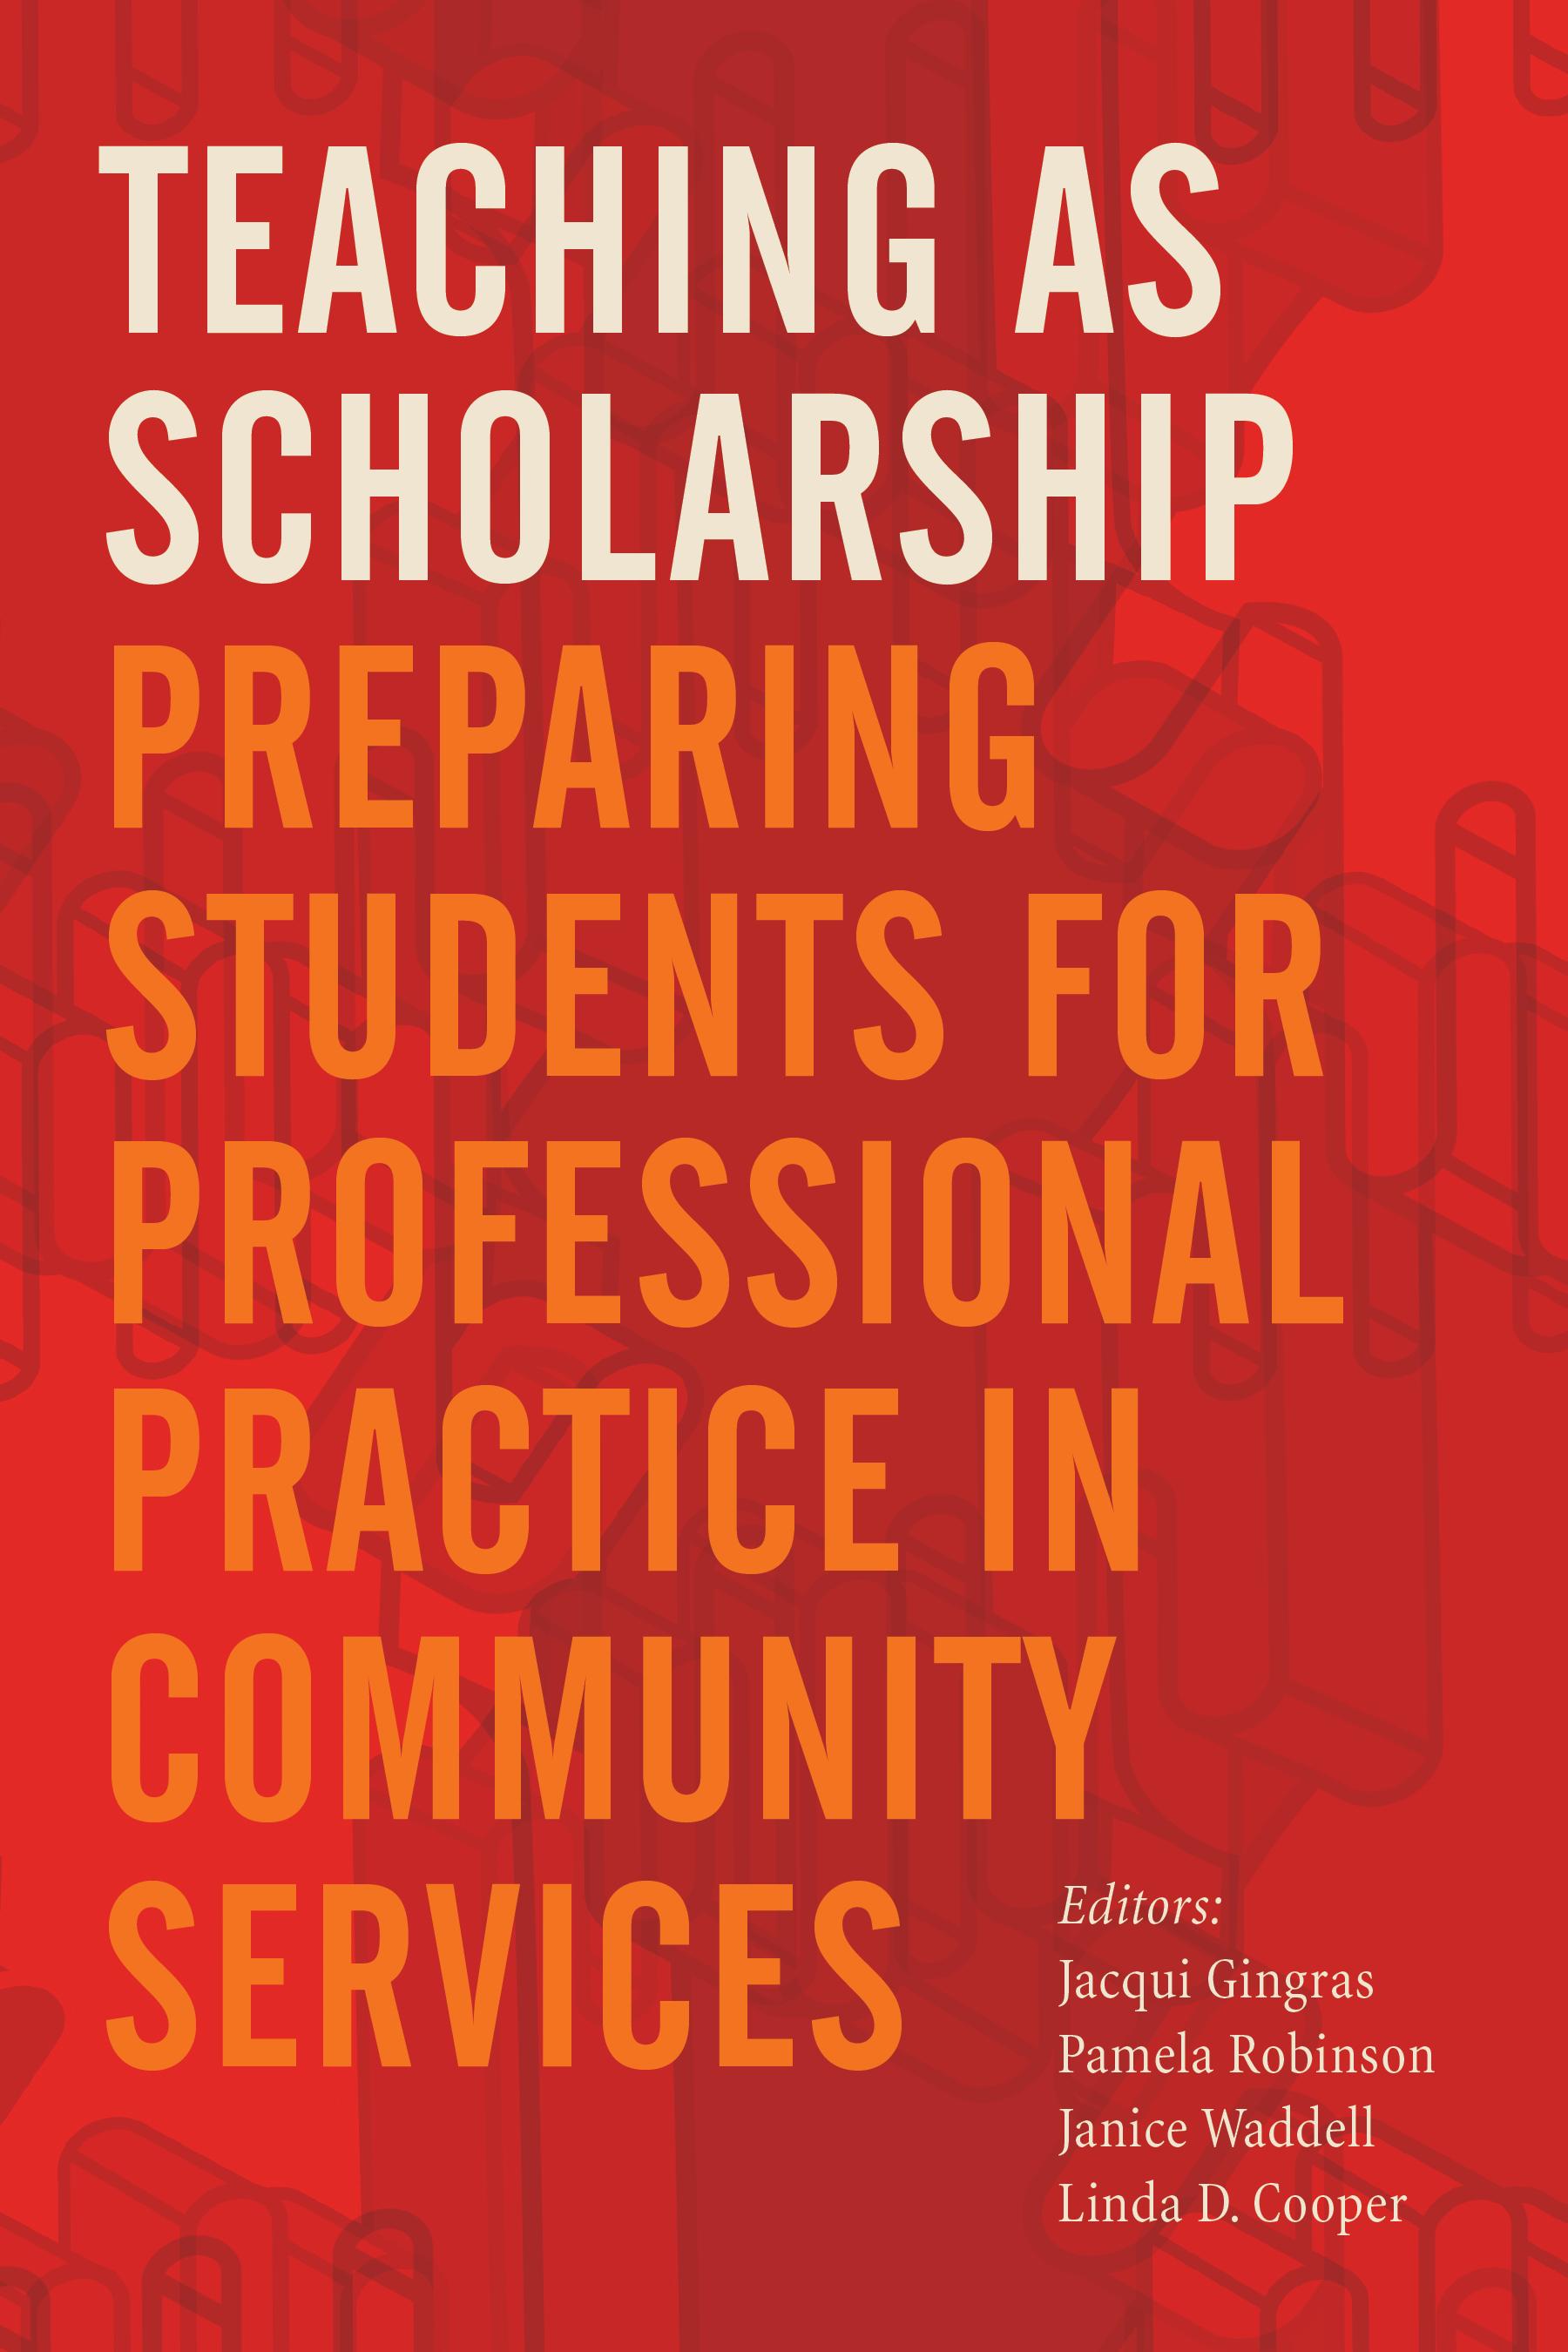 Teaching as Scholarship